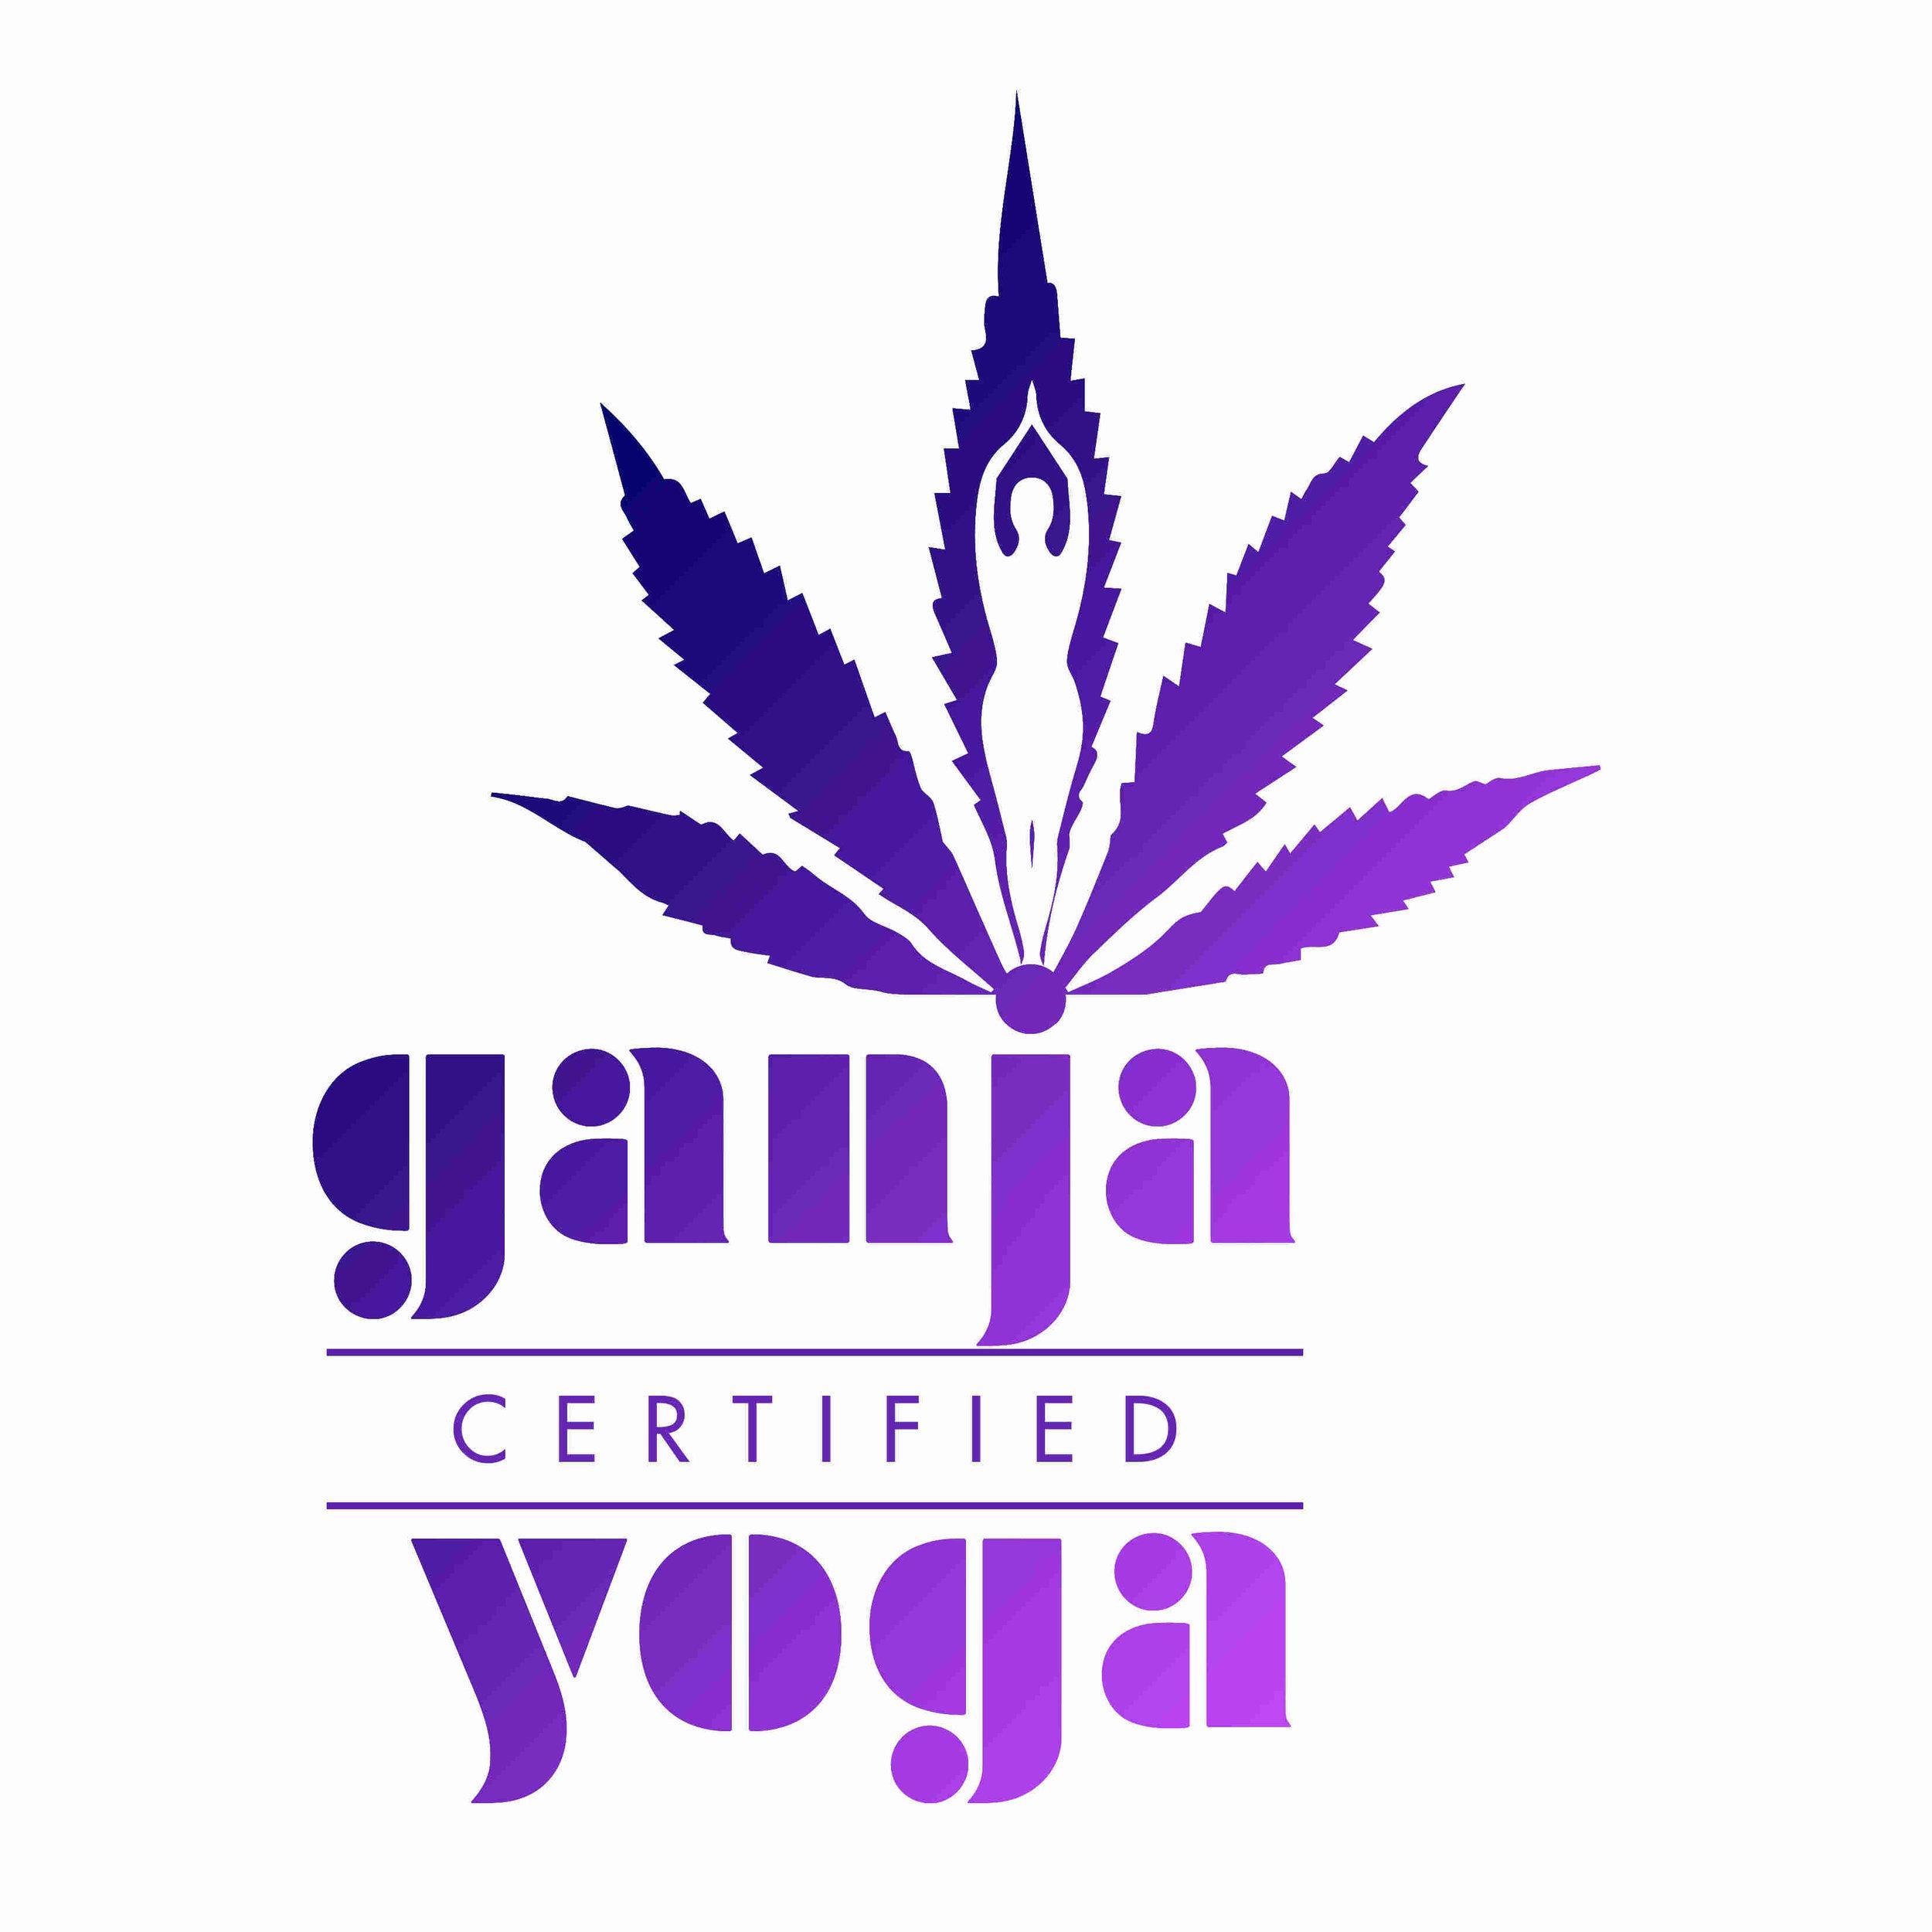 ganja-yoga-certified-final-low.jpg